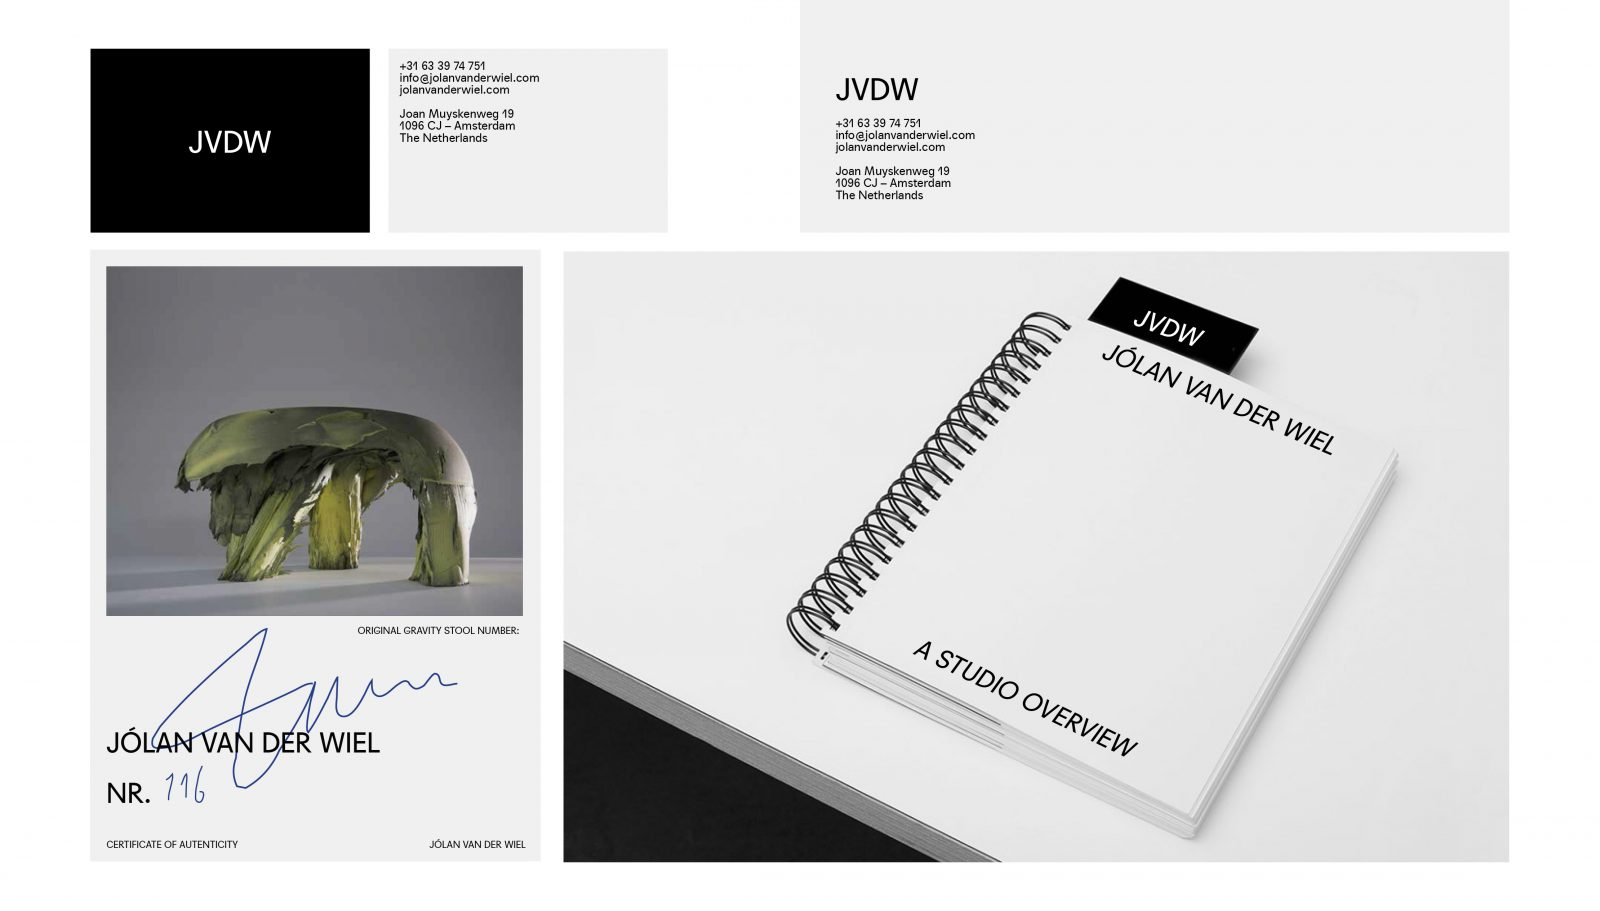 Maarten Kanters - Jólan van der Wiel – visual identity development, website and printed collateral